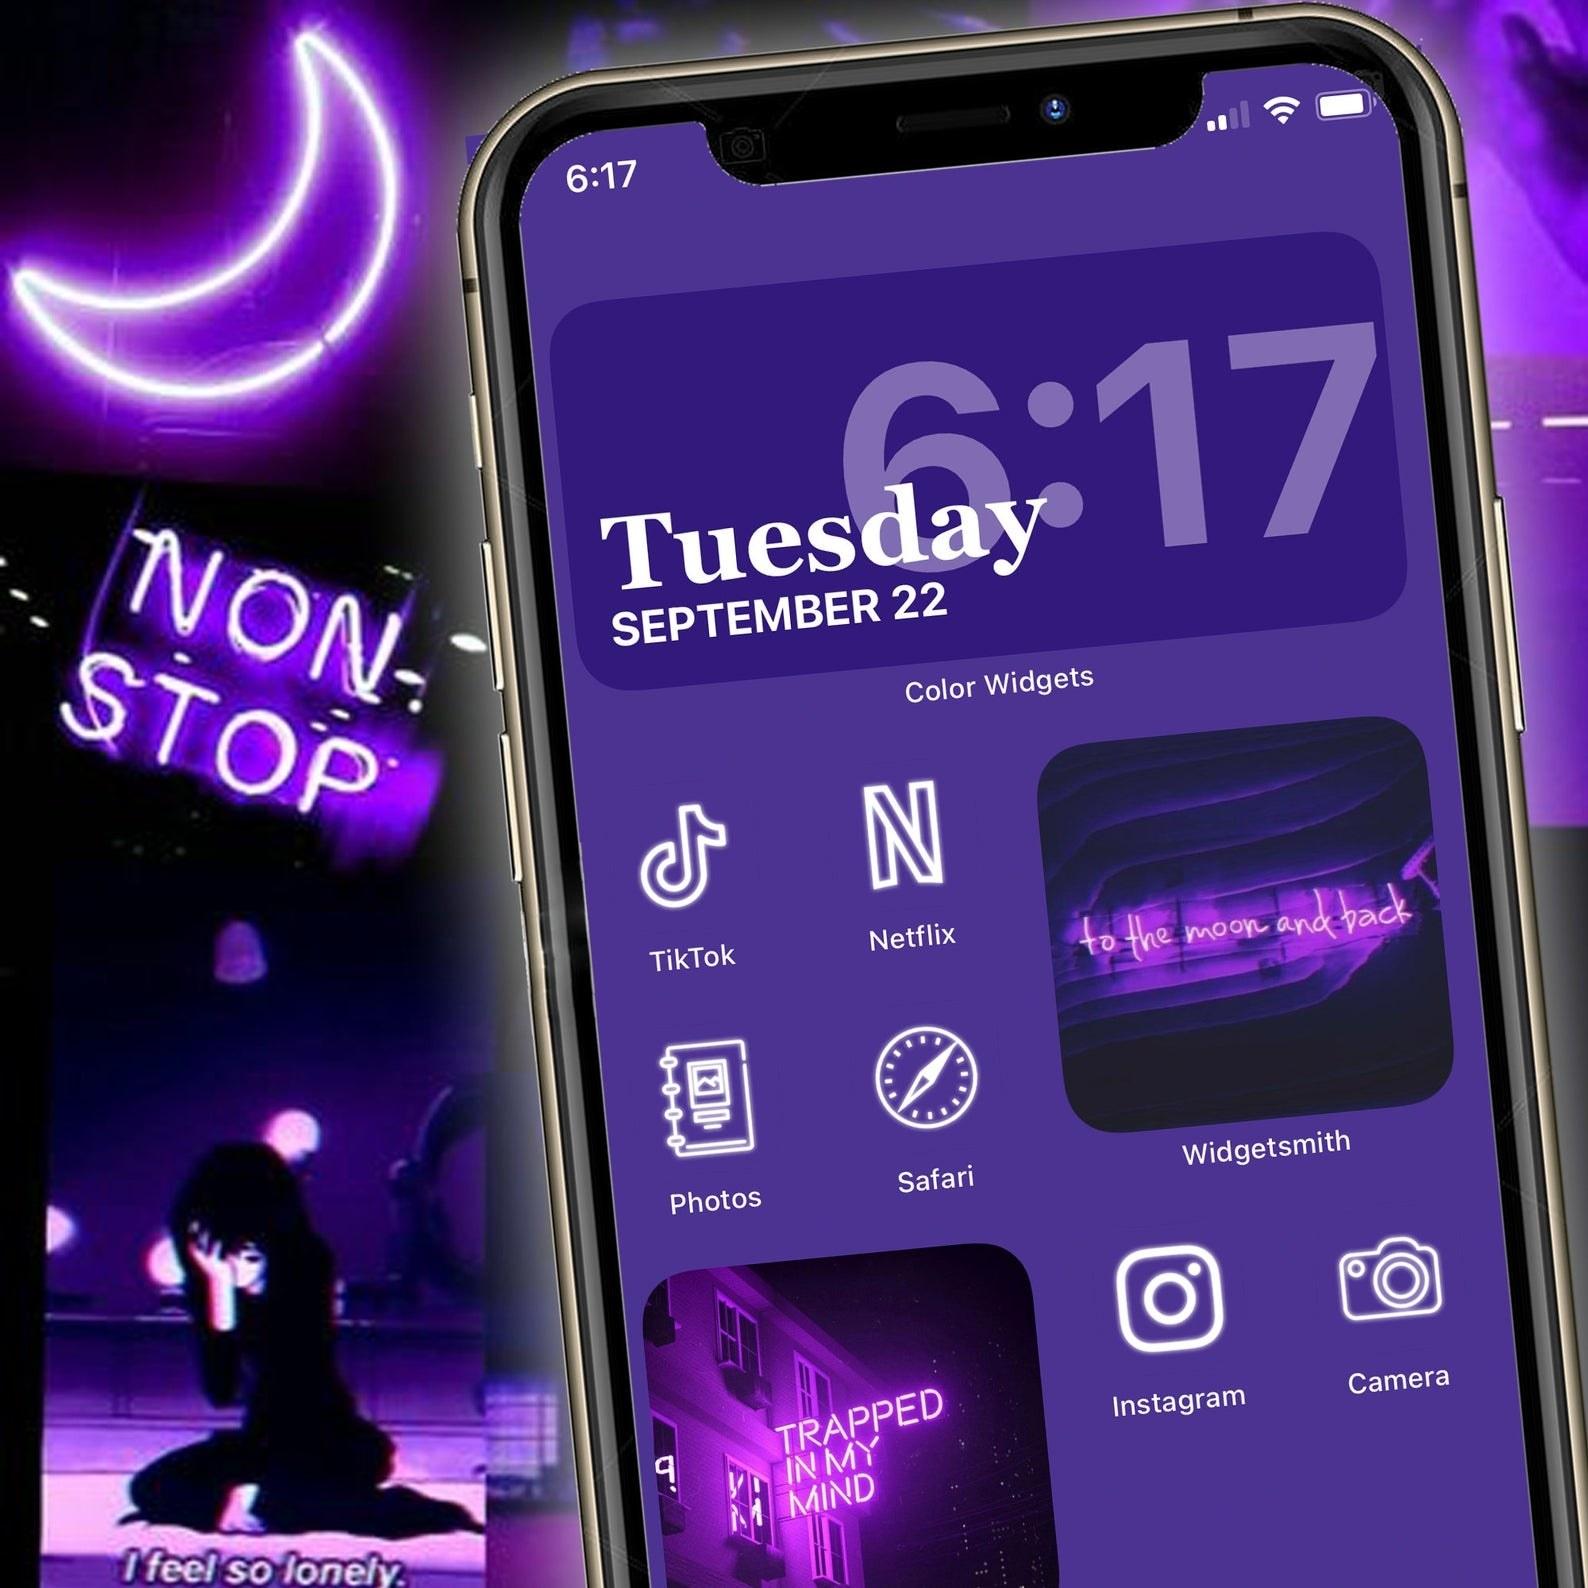 ios14 aesthetic app icon themes ios14 aesthetic app icon themes